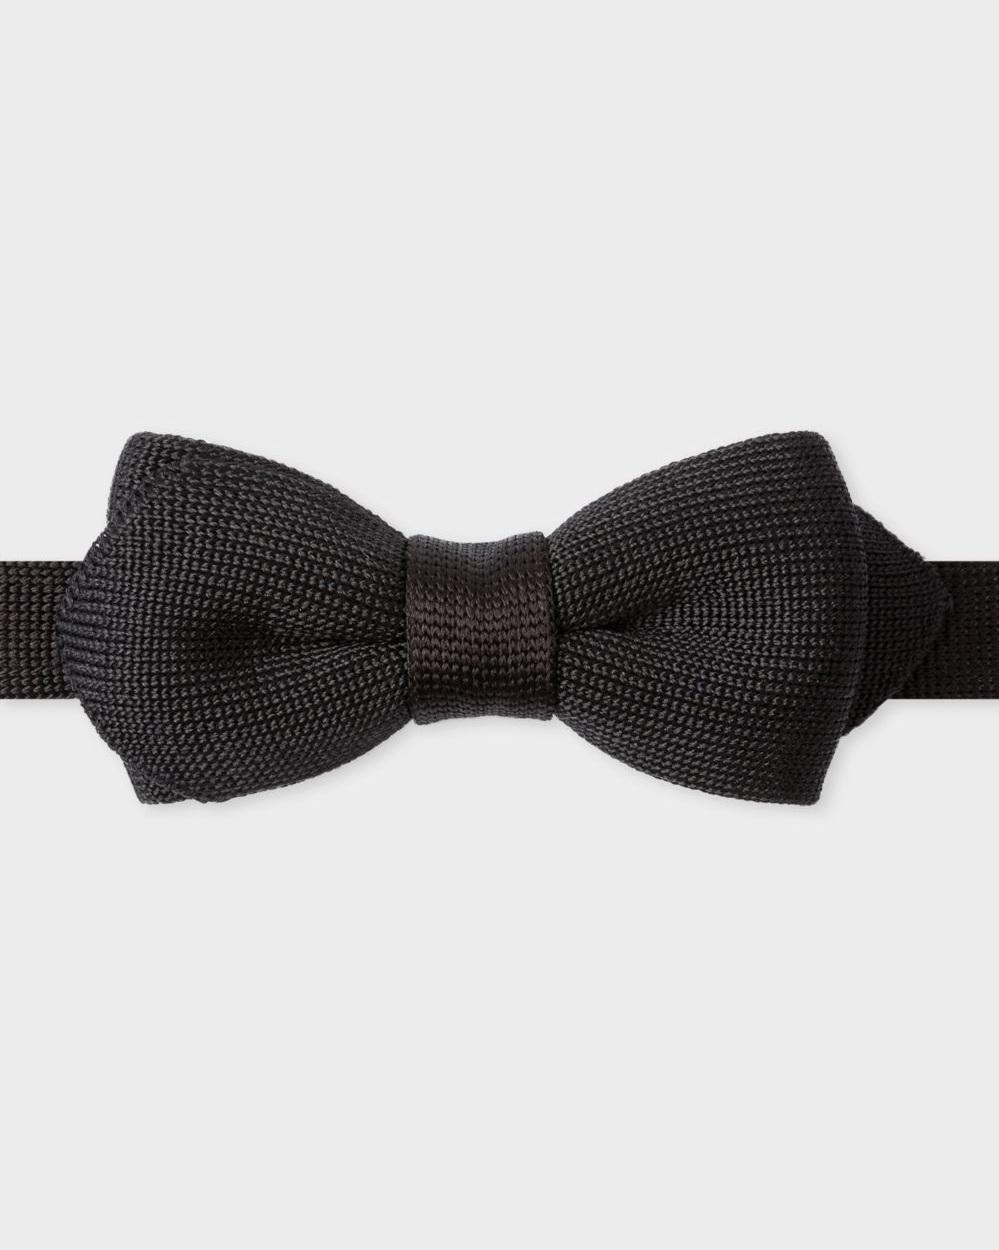 △ Paul Smith Men's Black Knitted Silk Bow Tie  GB£75 (~HK$720)